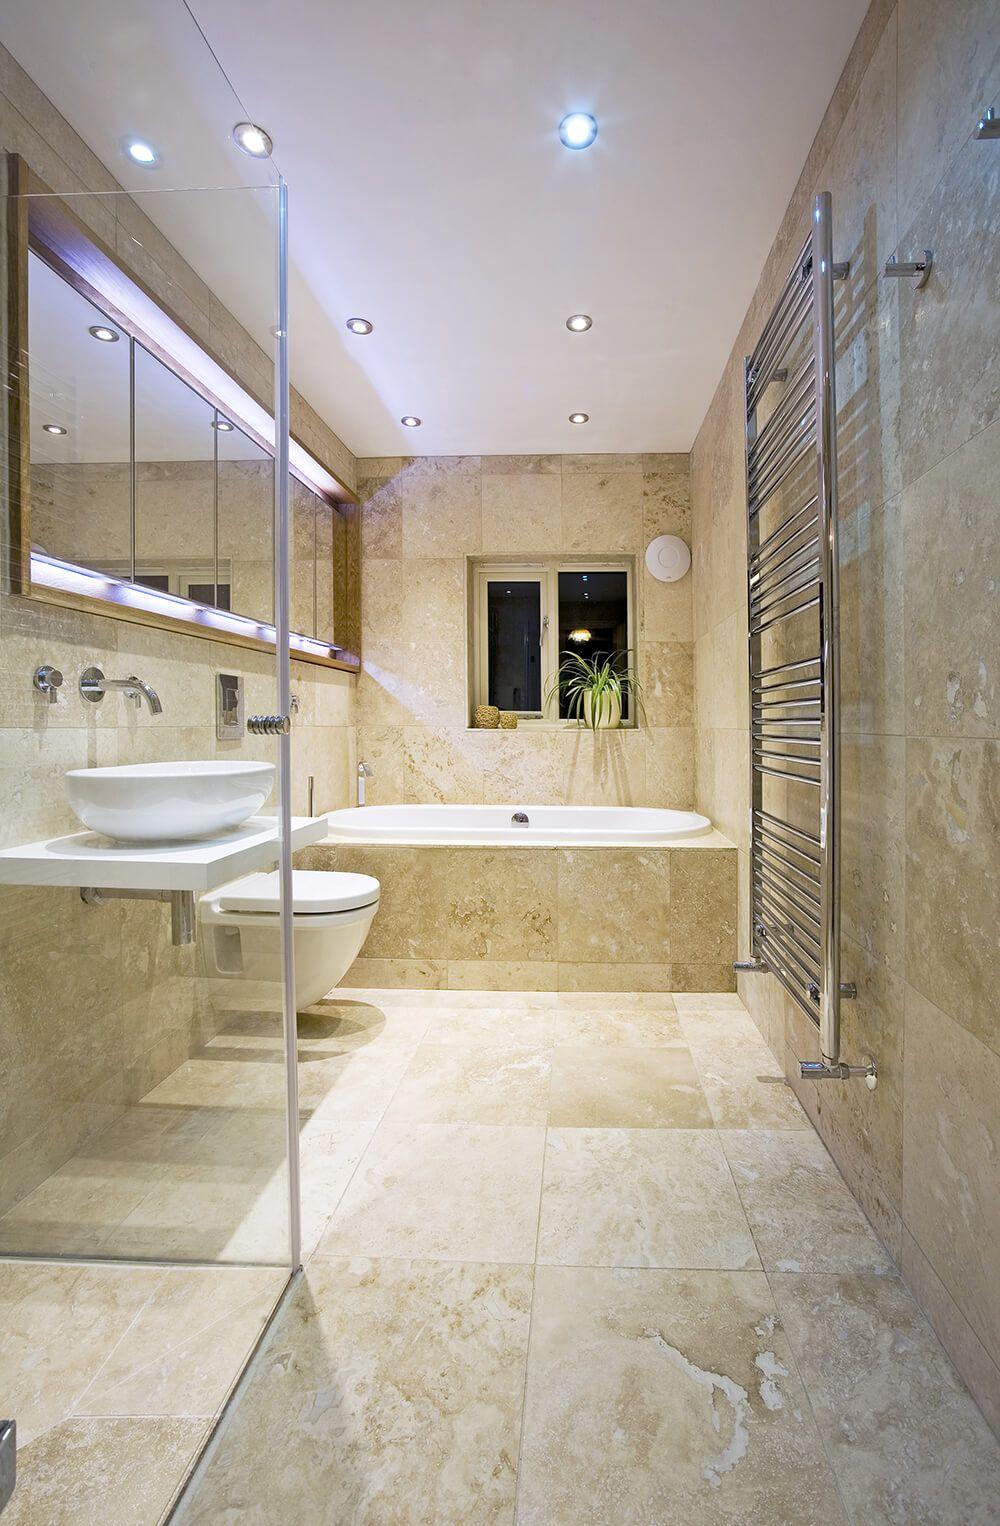 Beige Marble Floor And Wall Tiled Modern Bathroom Travertine